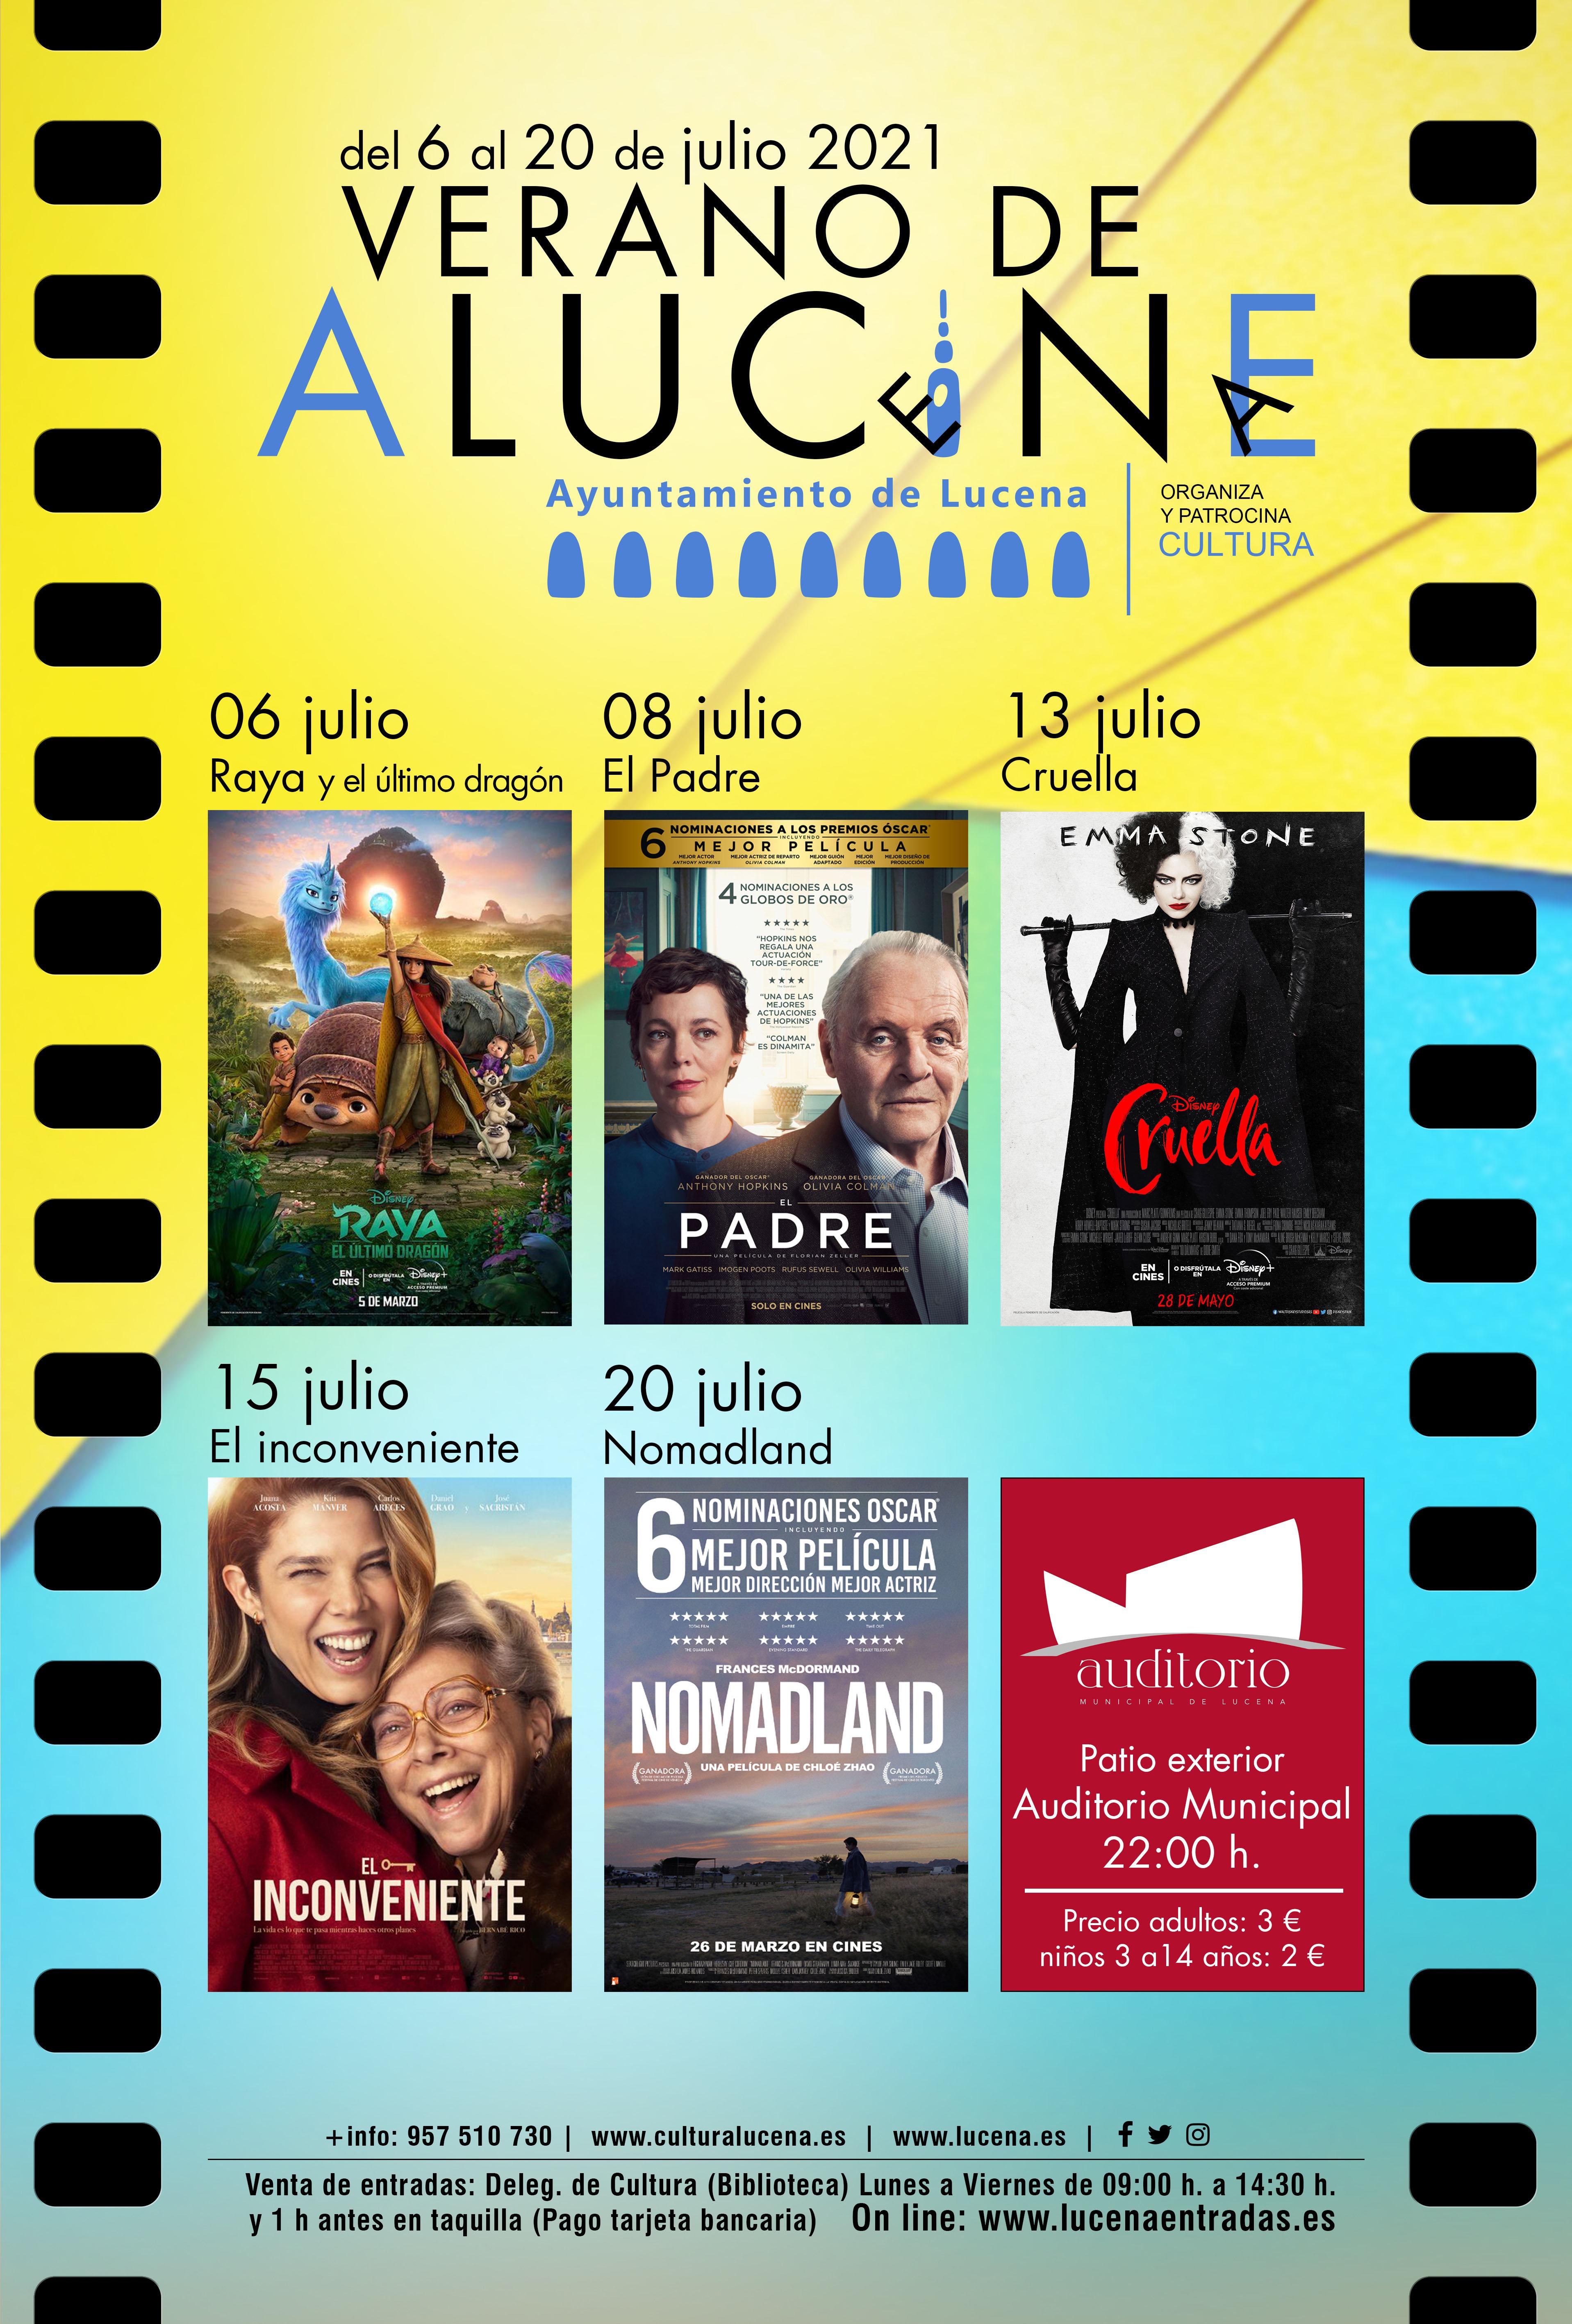 Verano de aluCine @ Auditorio de Lucena (patio)